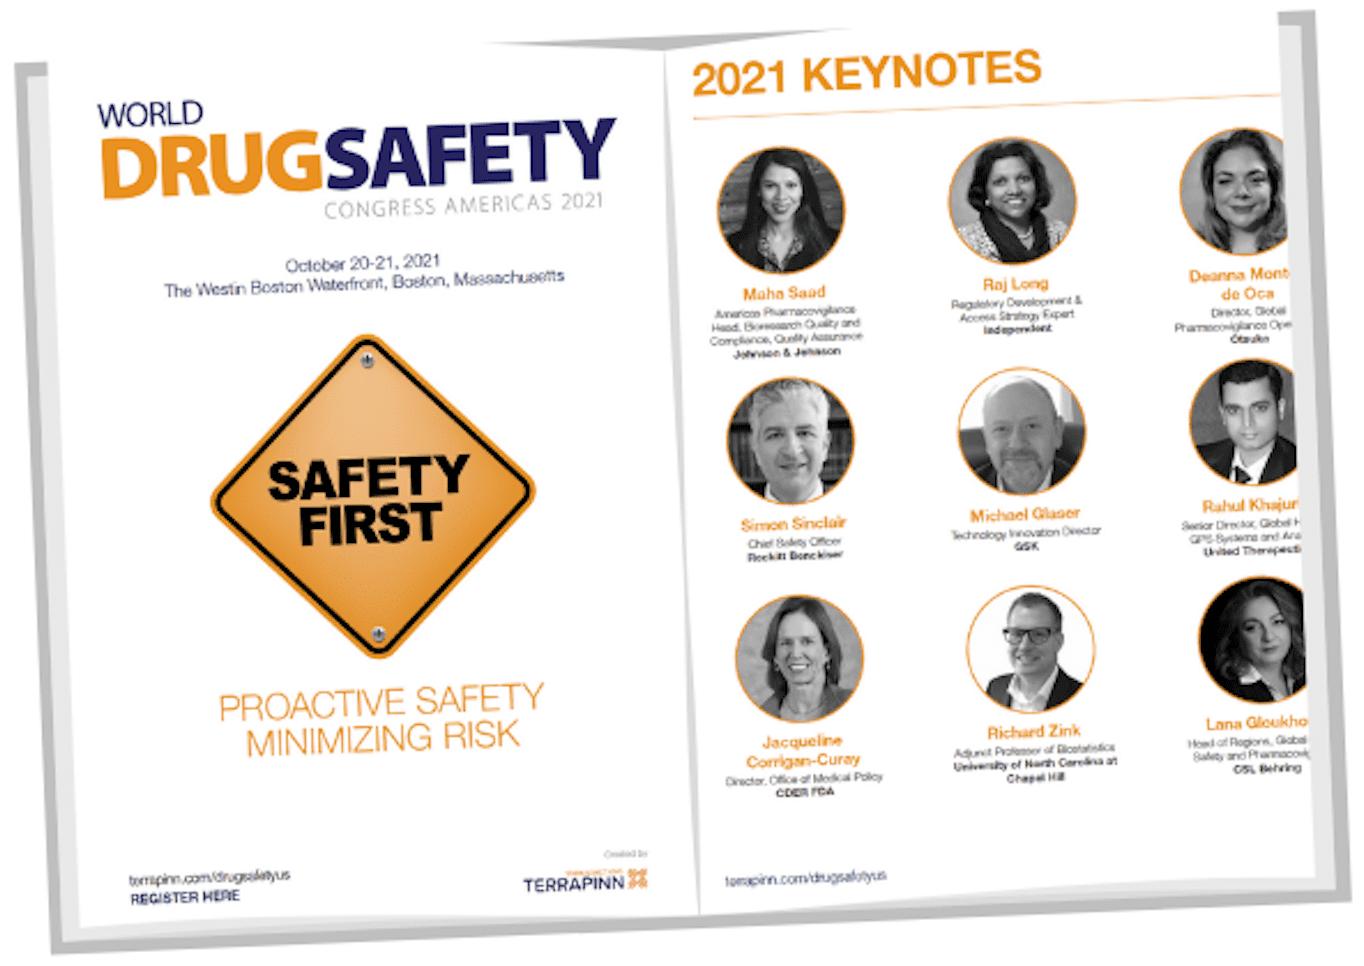 World Drug Safety Congress Americas 2021 brochure